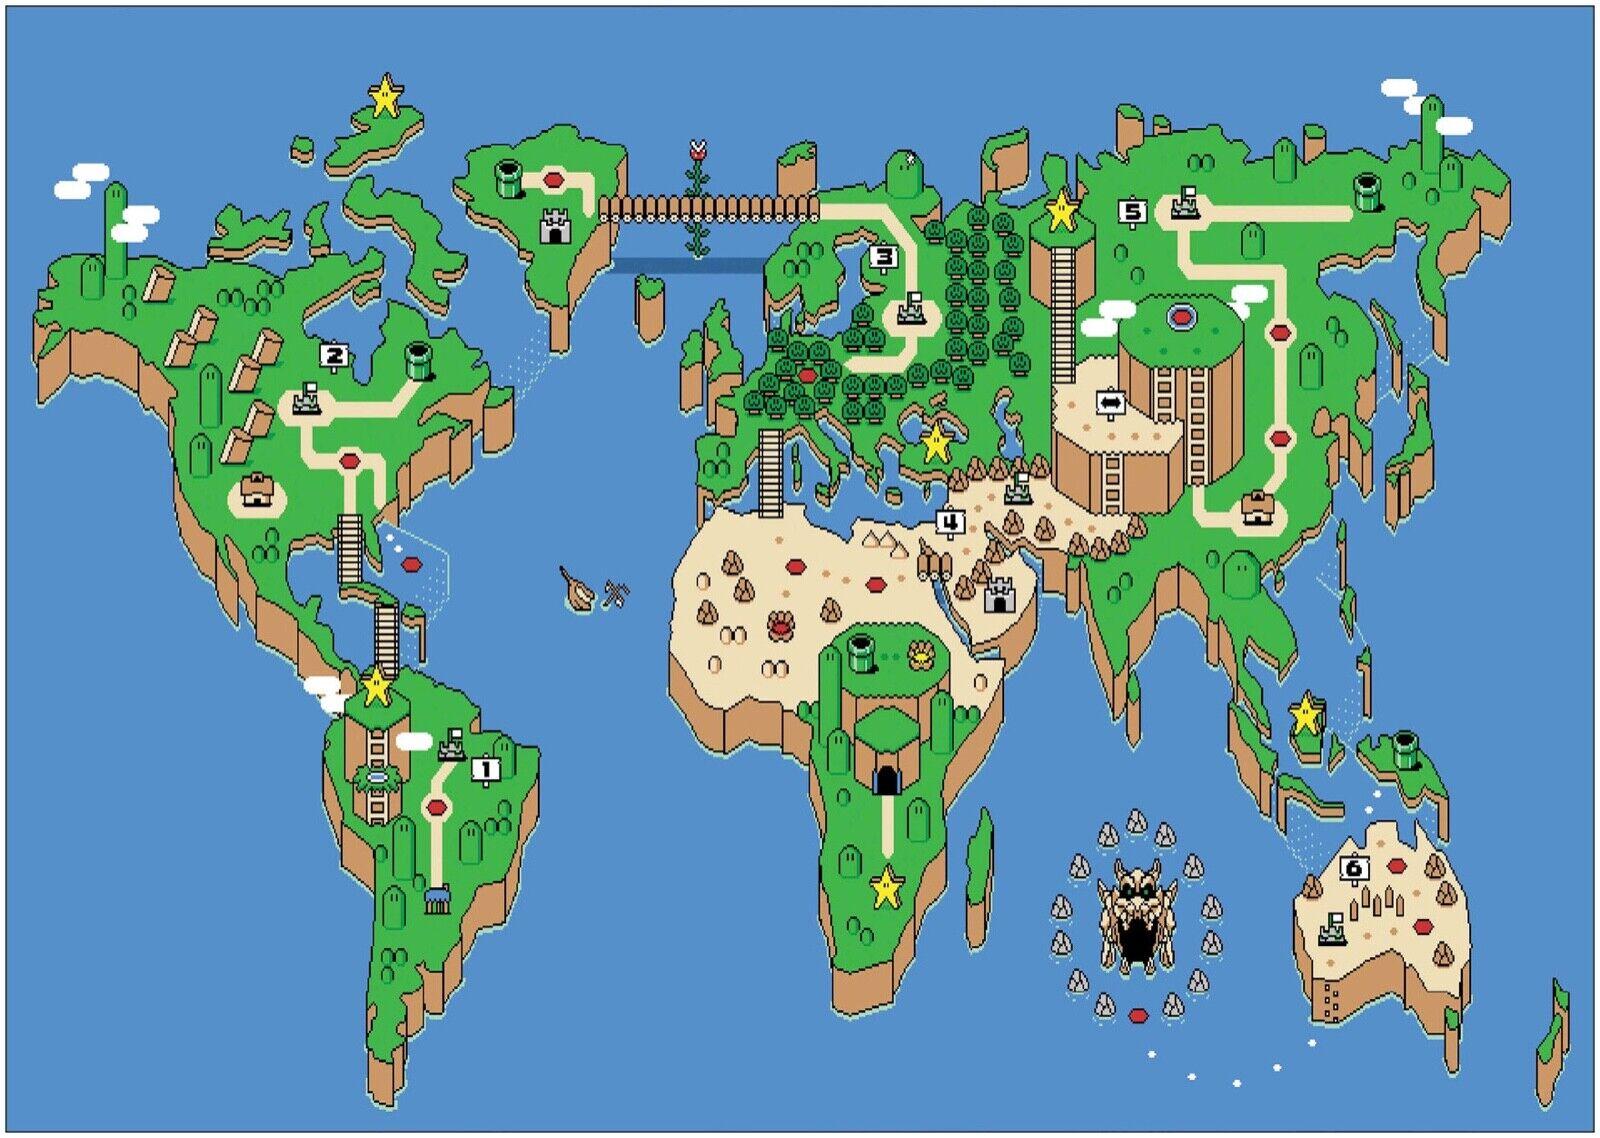 Super Mario World Retro Gaming Map Large CANVAS Art Print A0 A1 A2 A3 A4